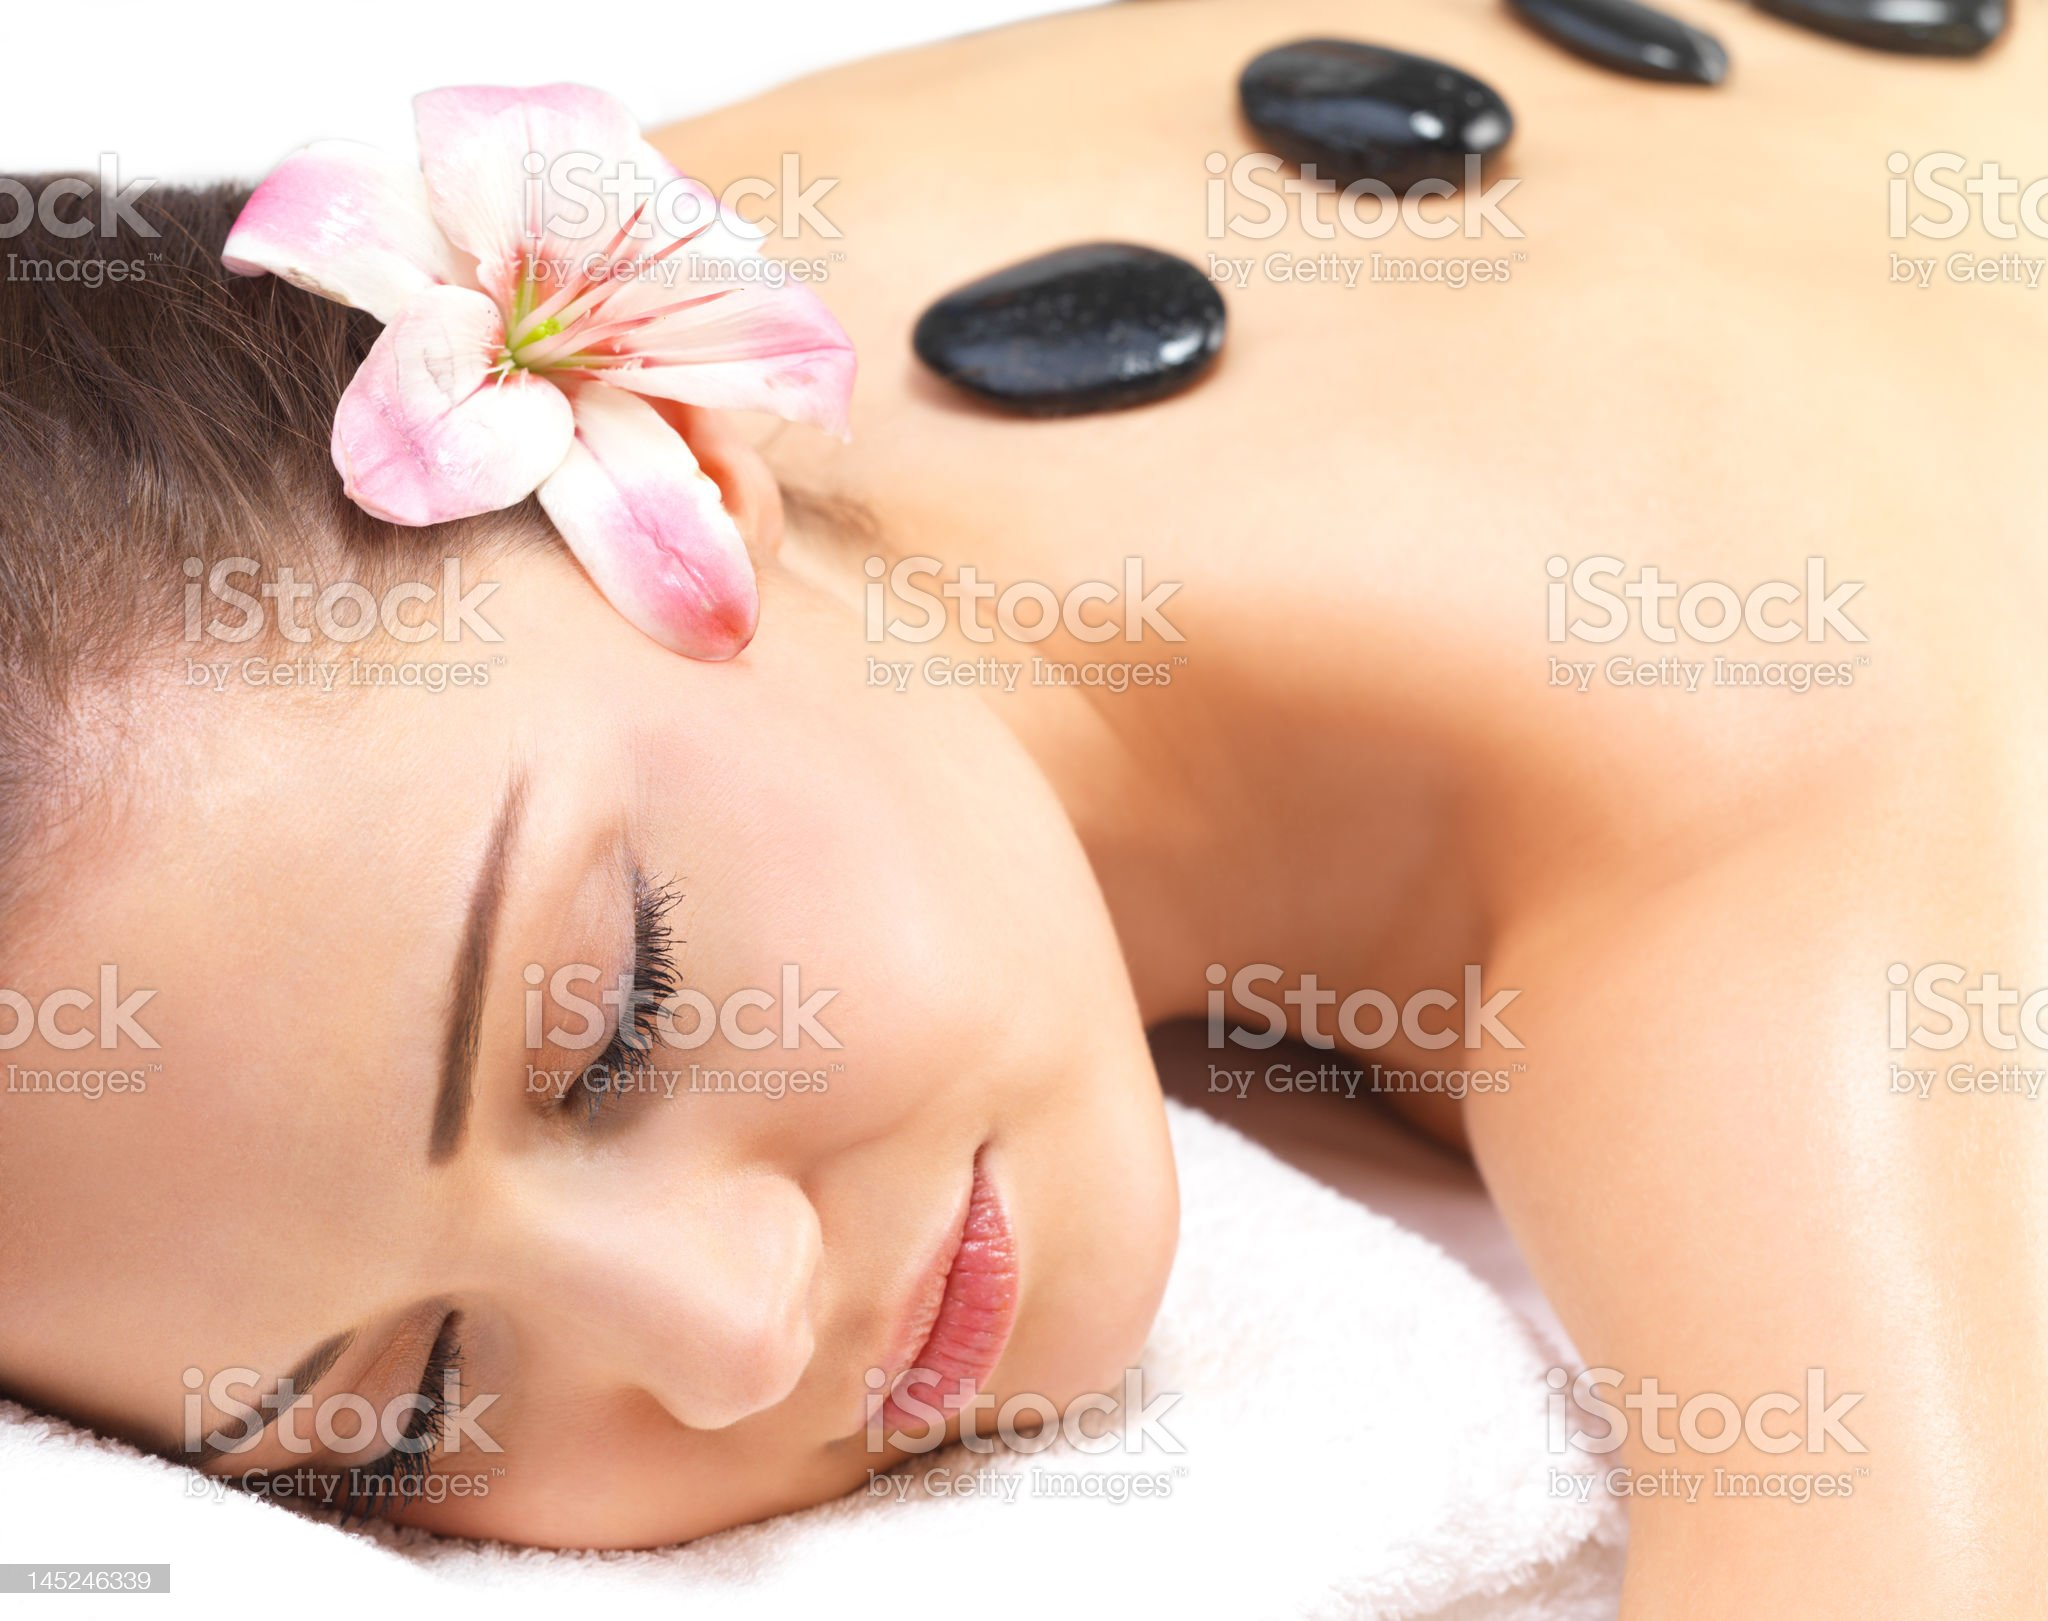 Beautiful young woman getting hot stone massage royalty-free stock photo